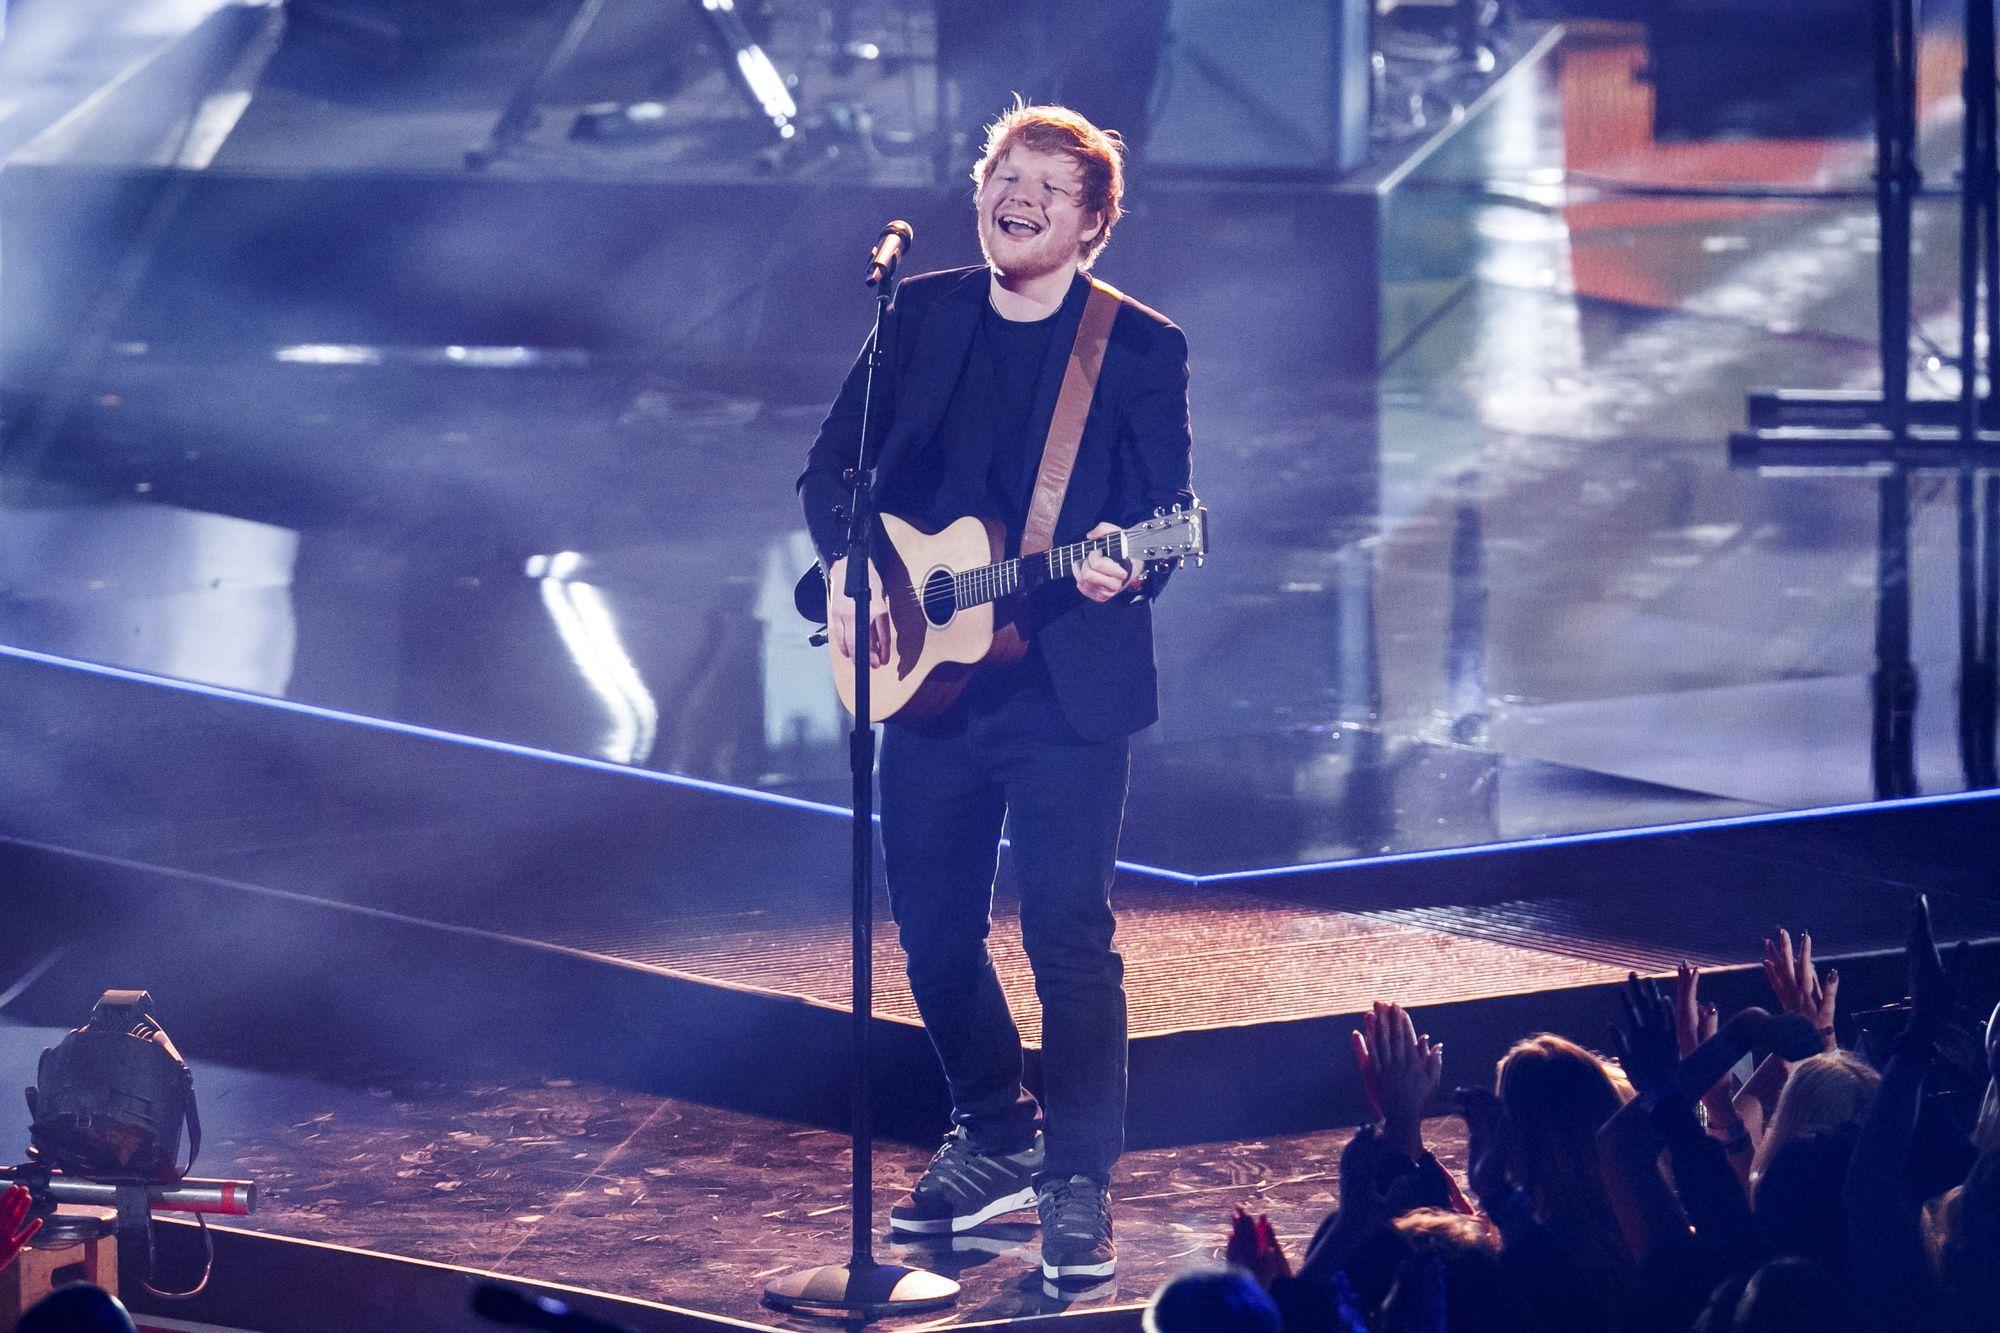 Le Nouvel Album D Ed Sheeran Bat Des Records De Vente En